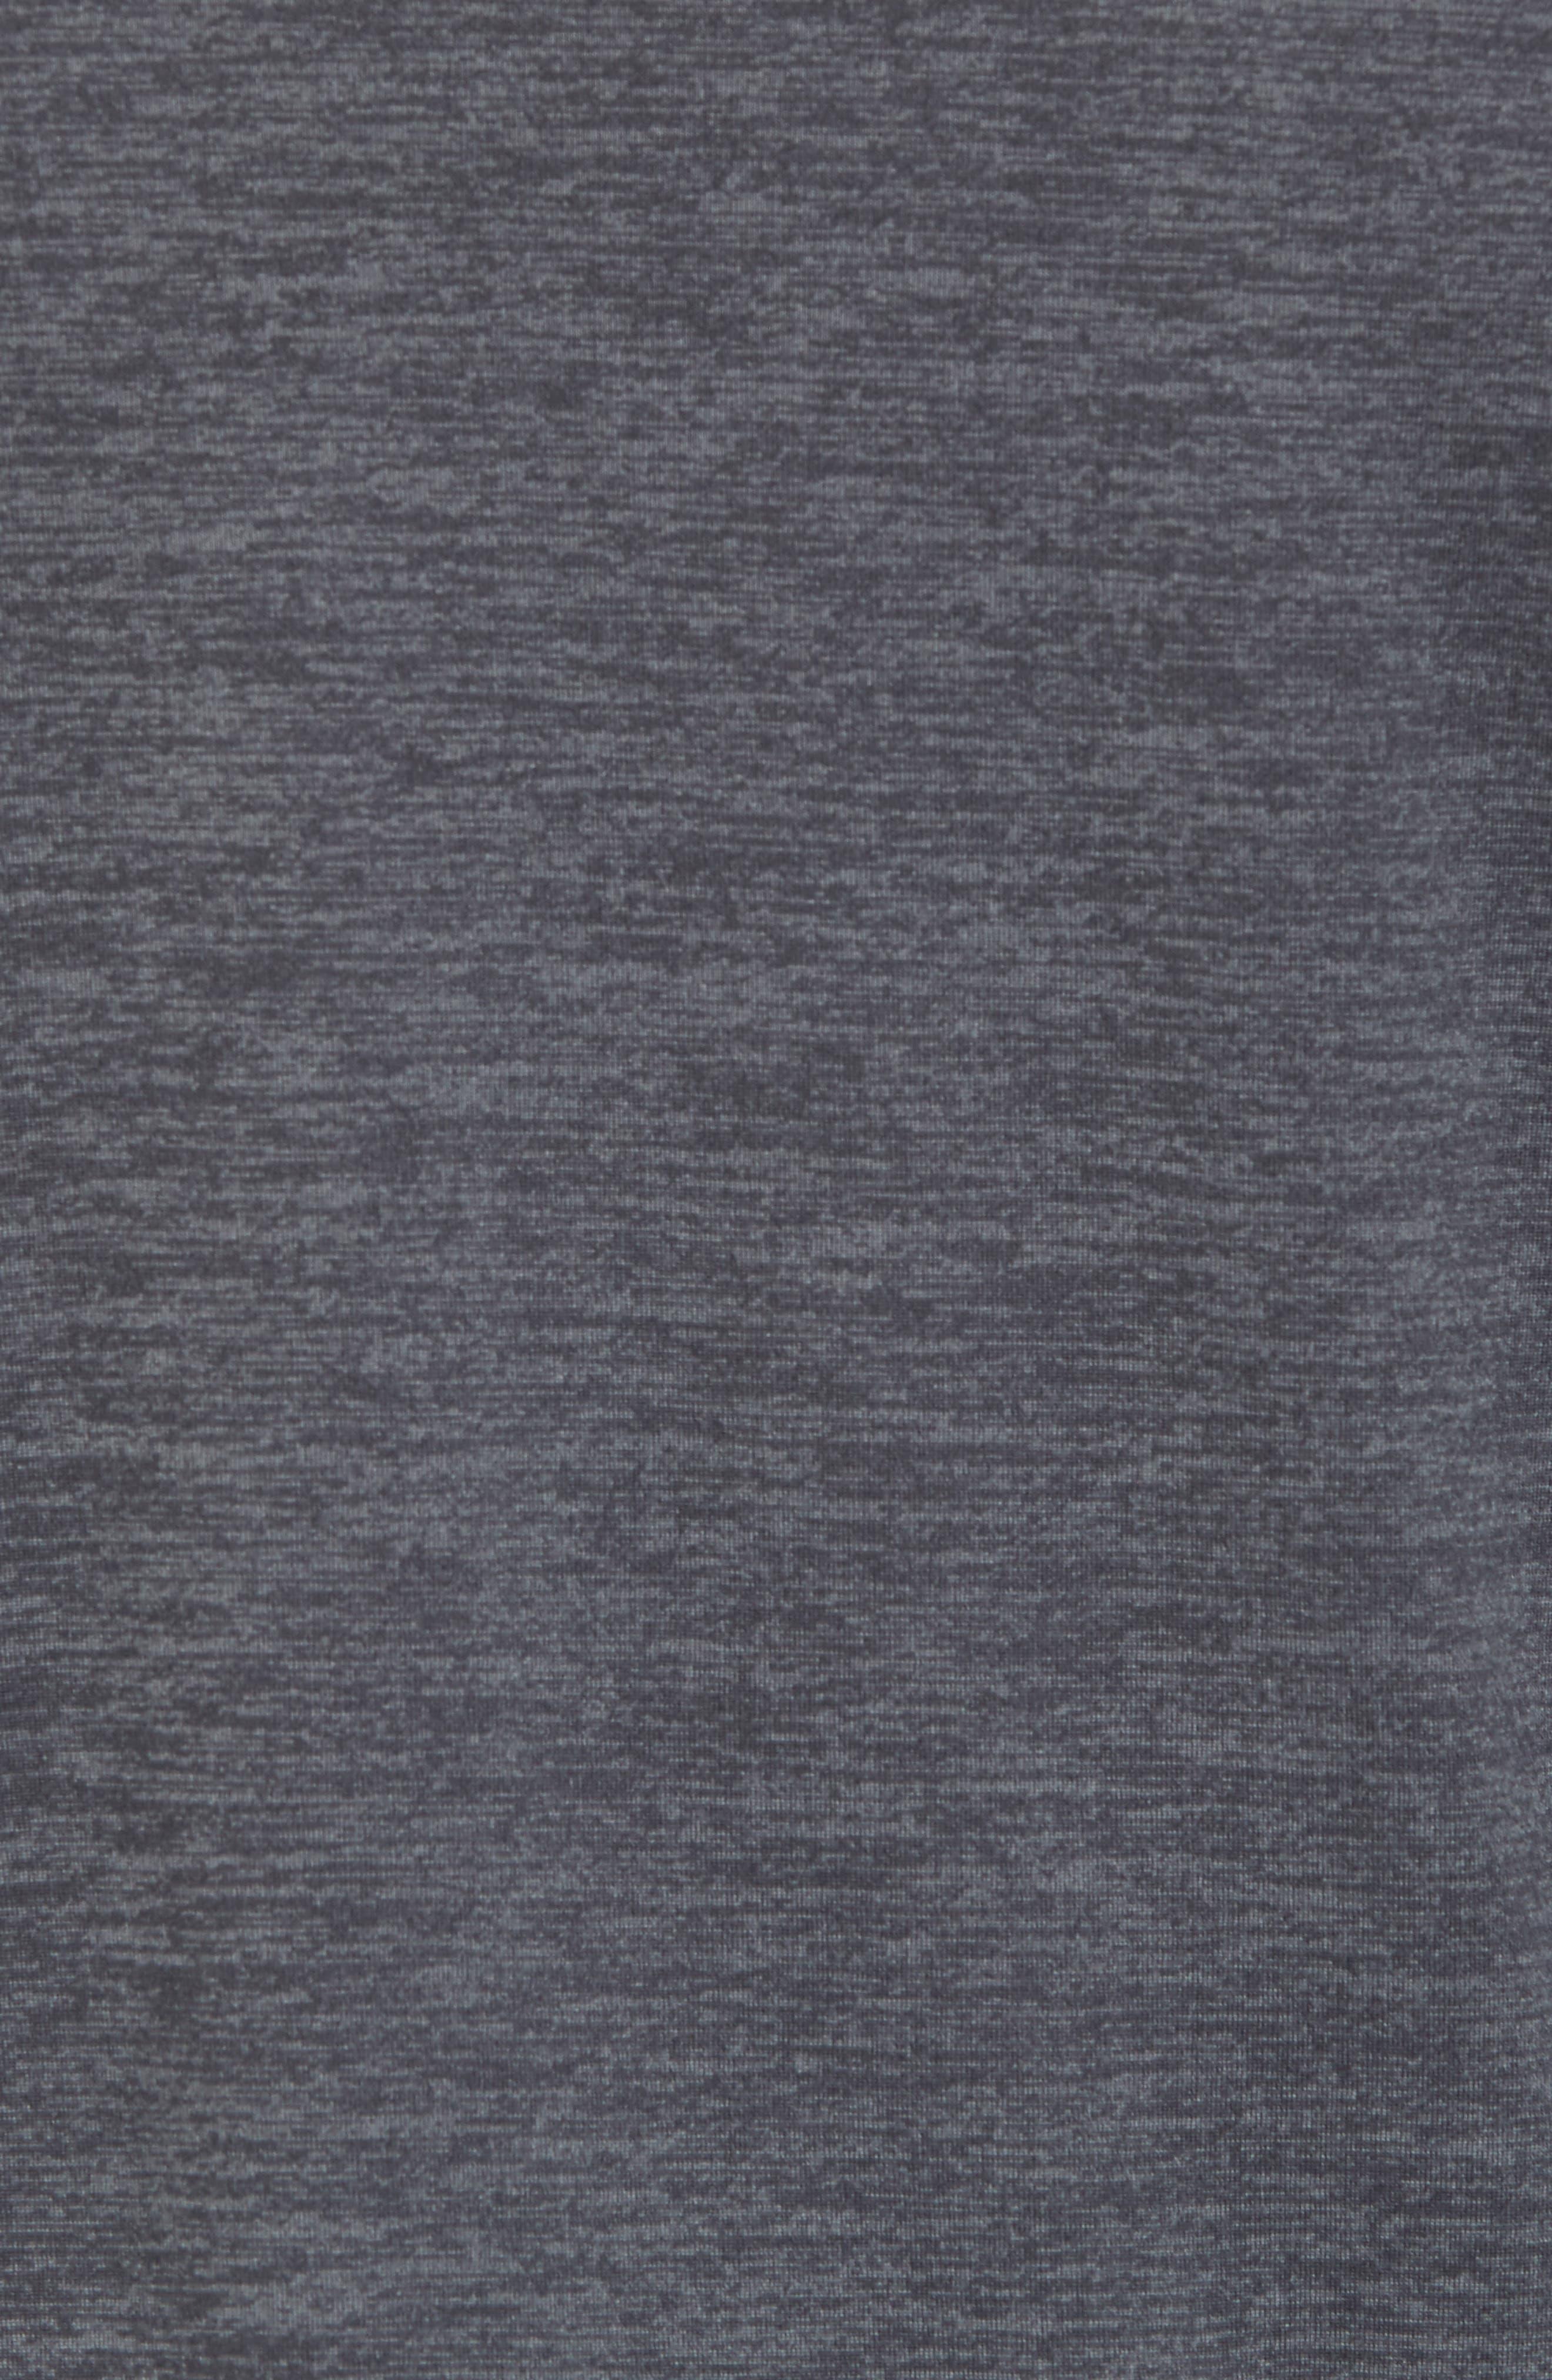 Larosite Athletic Fit T-Shirt,                             Alternate thumbnail 5, color,                             GREY EBONY MELANGE